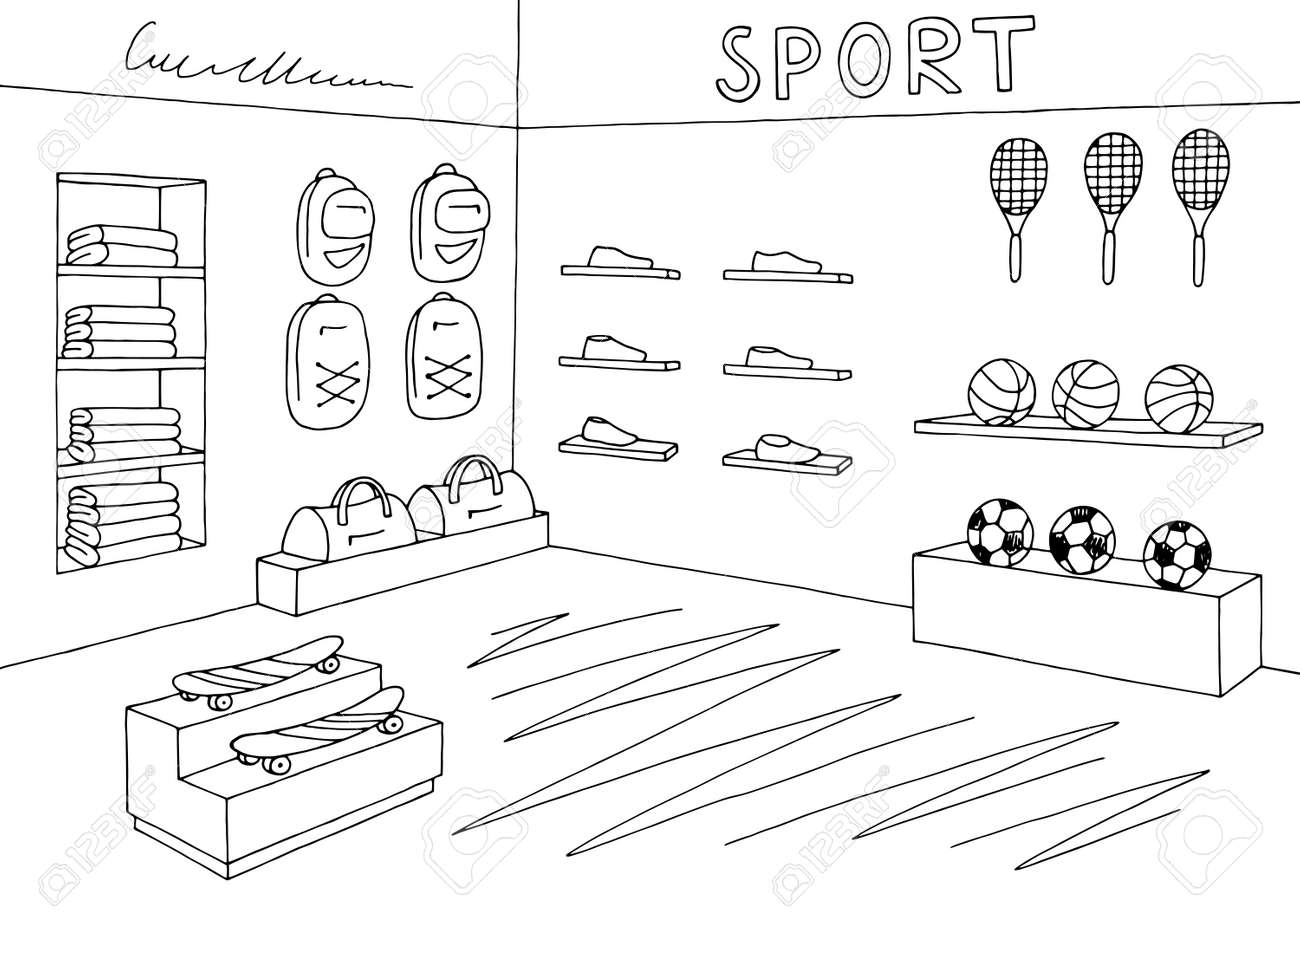 hight resolution of sport shop store graphic interior black white sketch illustration vector stock vector 101830598